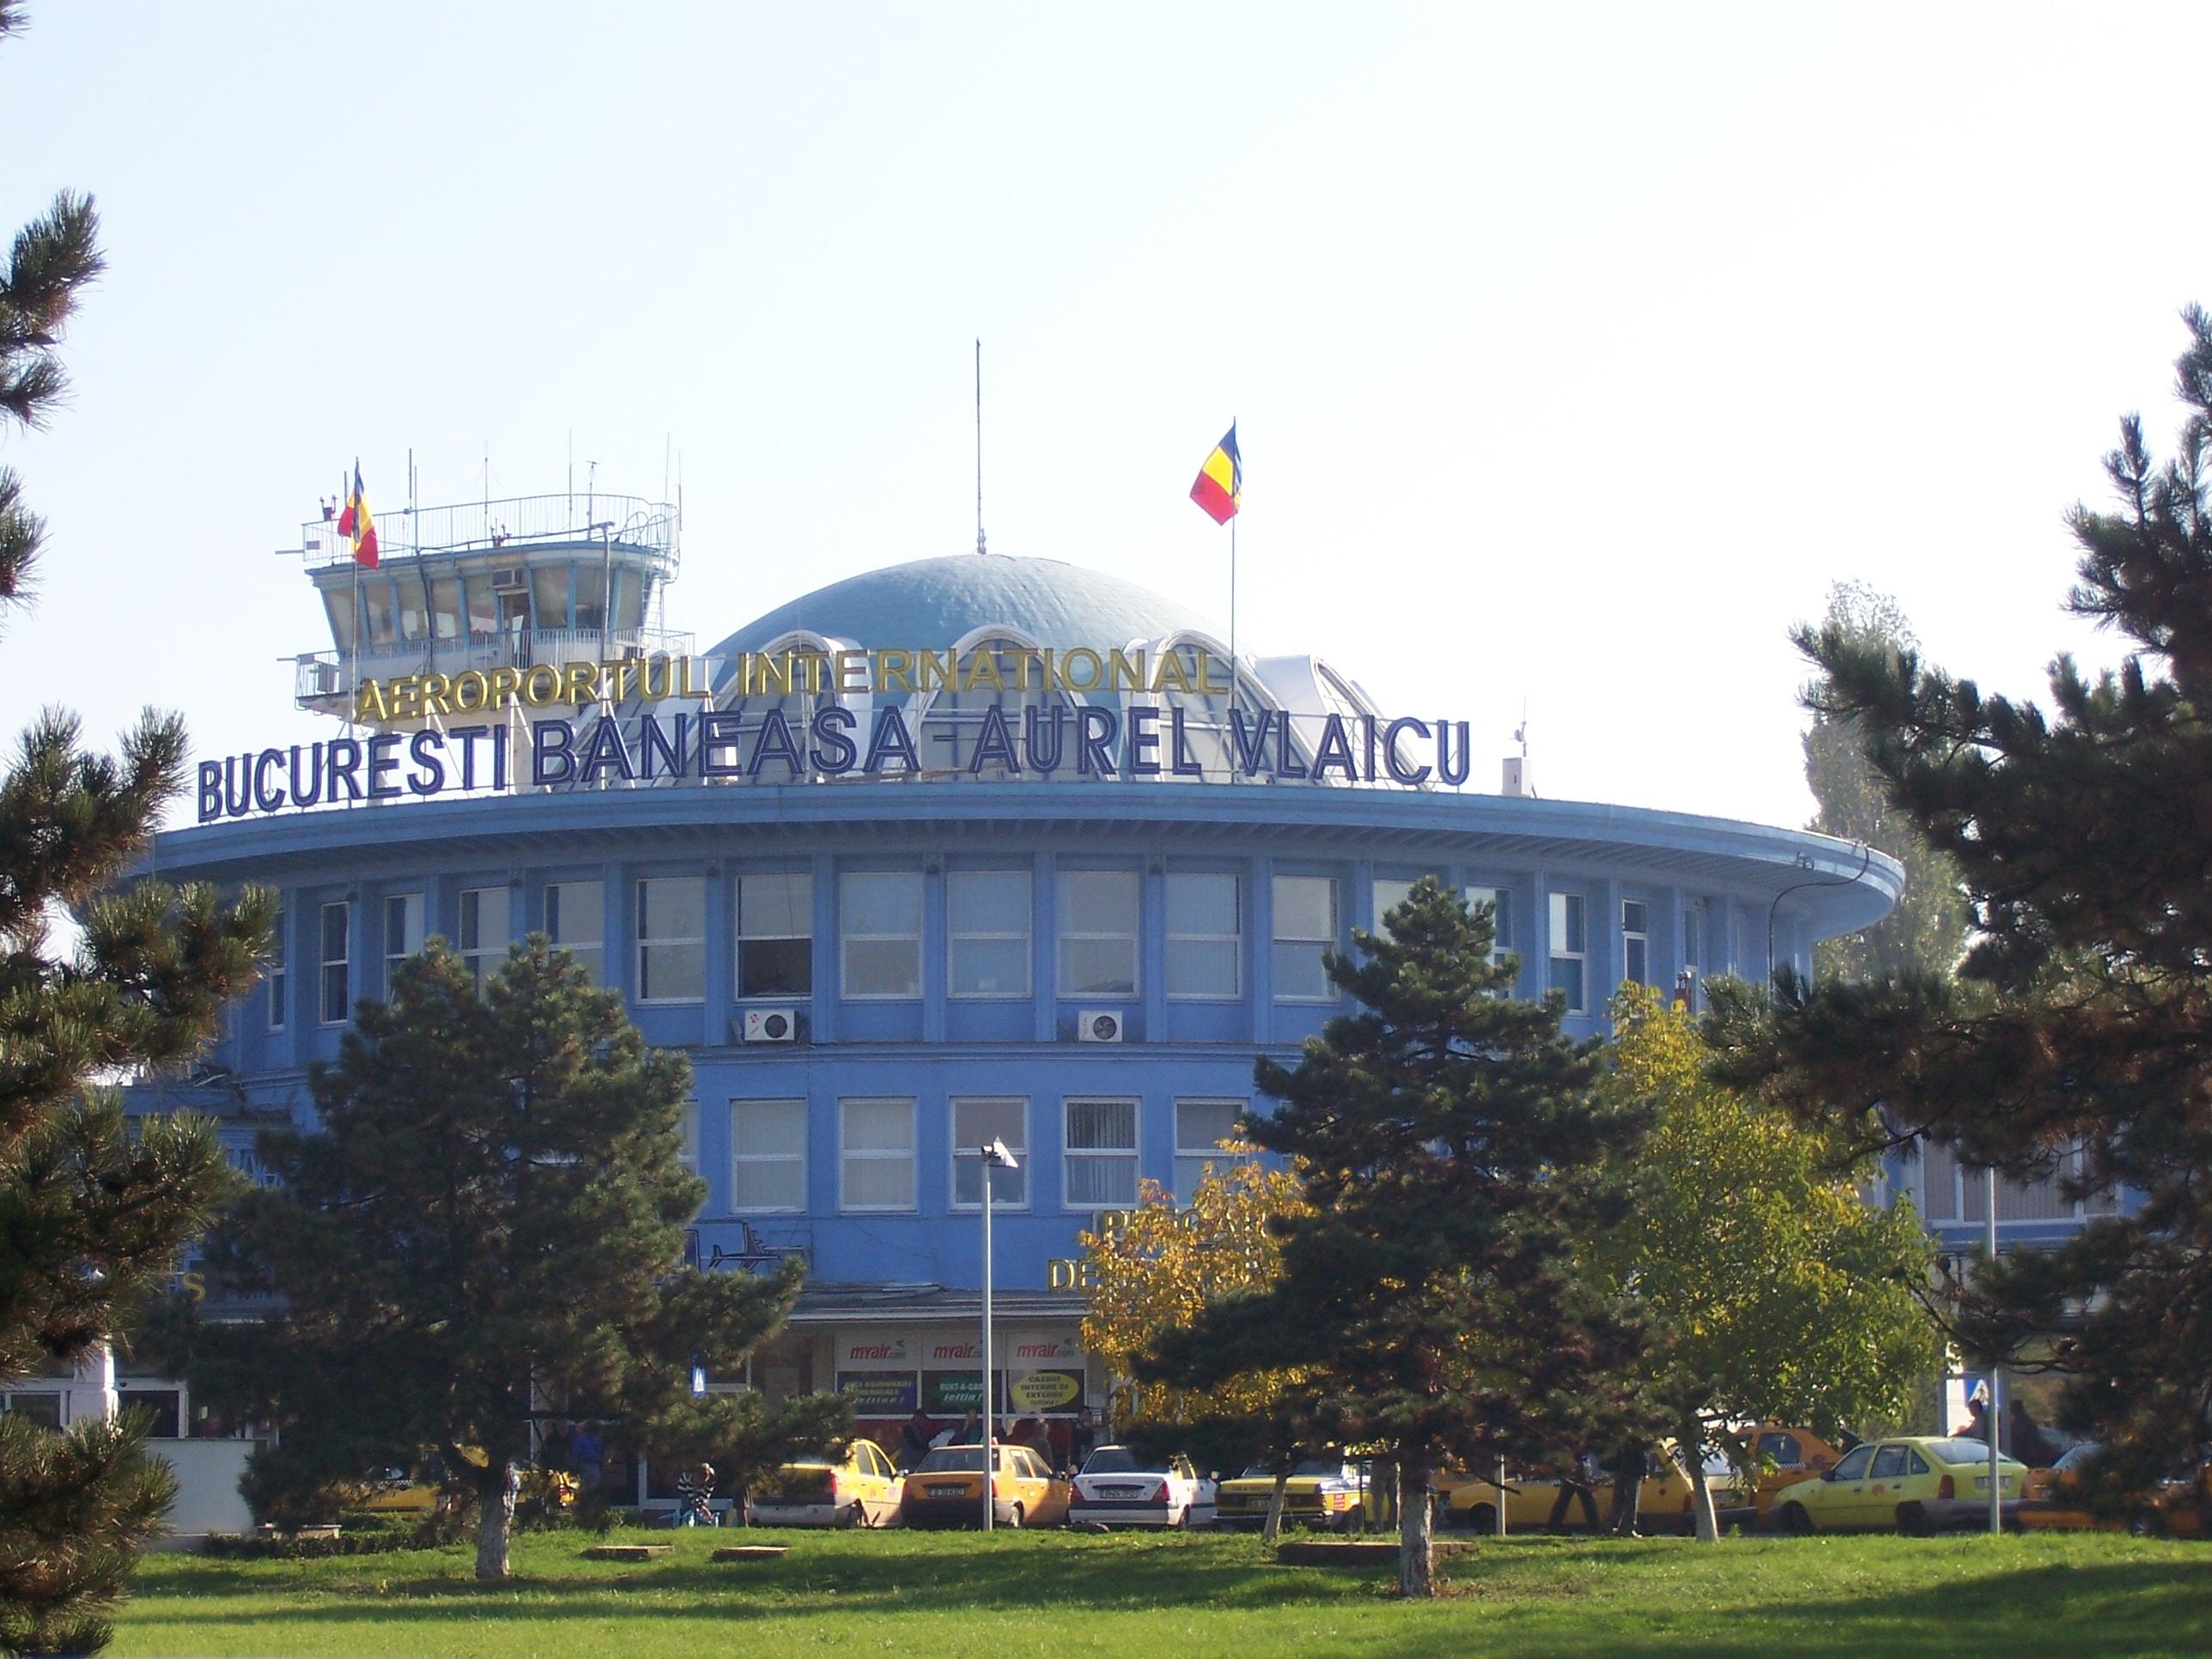 Aeroporto Bucarest : Diminuiscono i voli low cost per bucarest balcani online